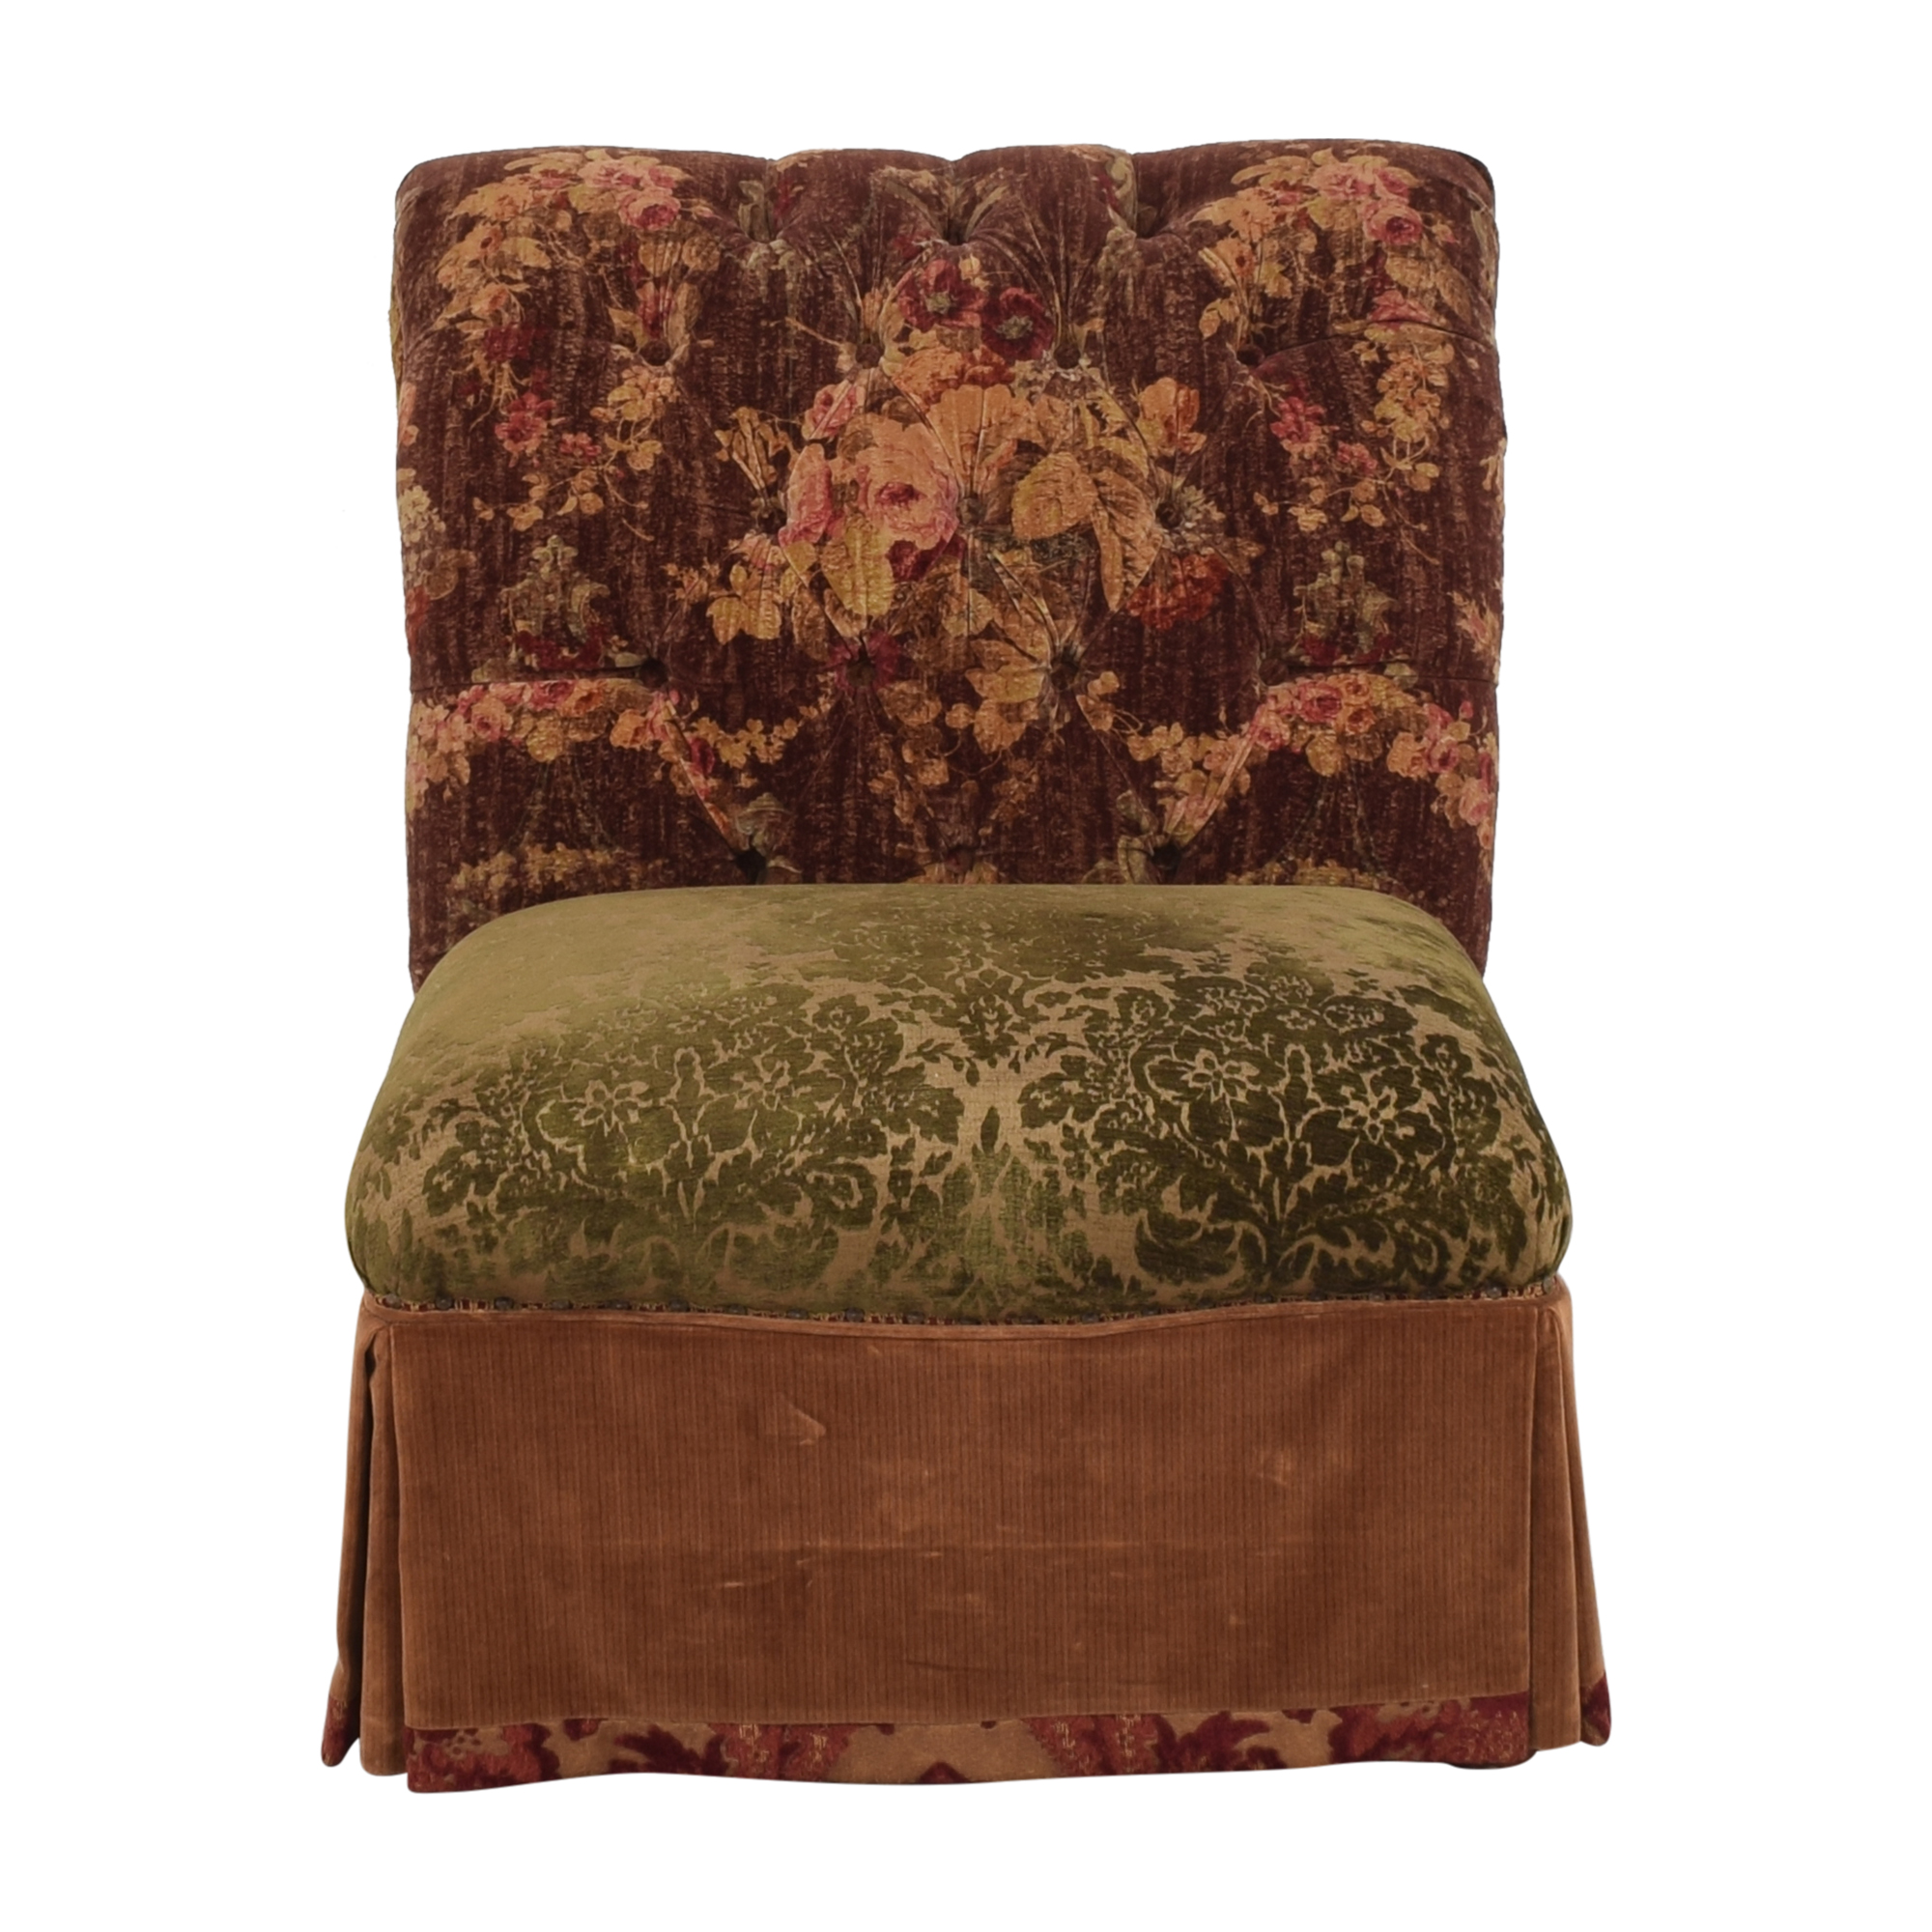 buy Domain Home Victoria Slipper Chair Domain Home Chairs